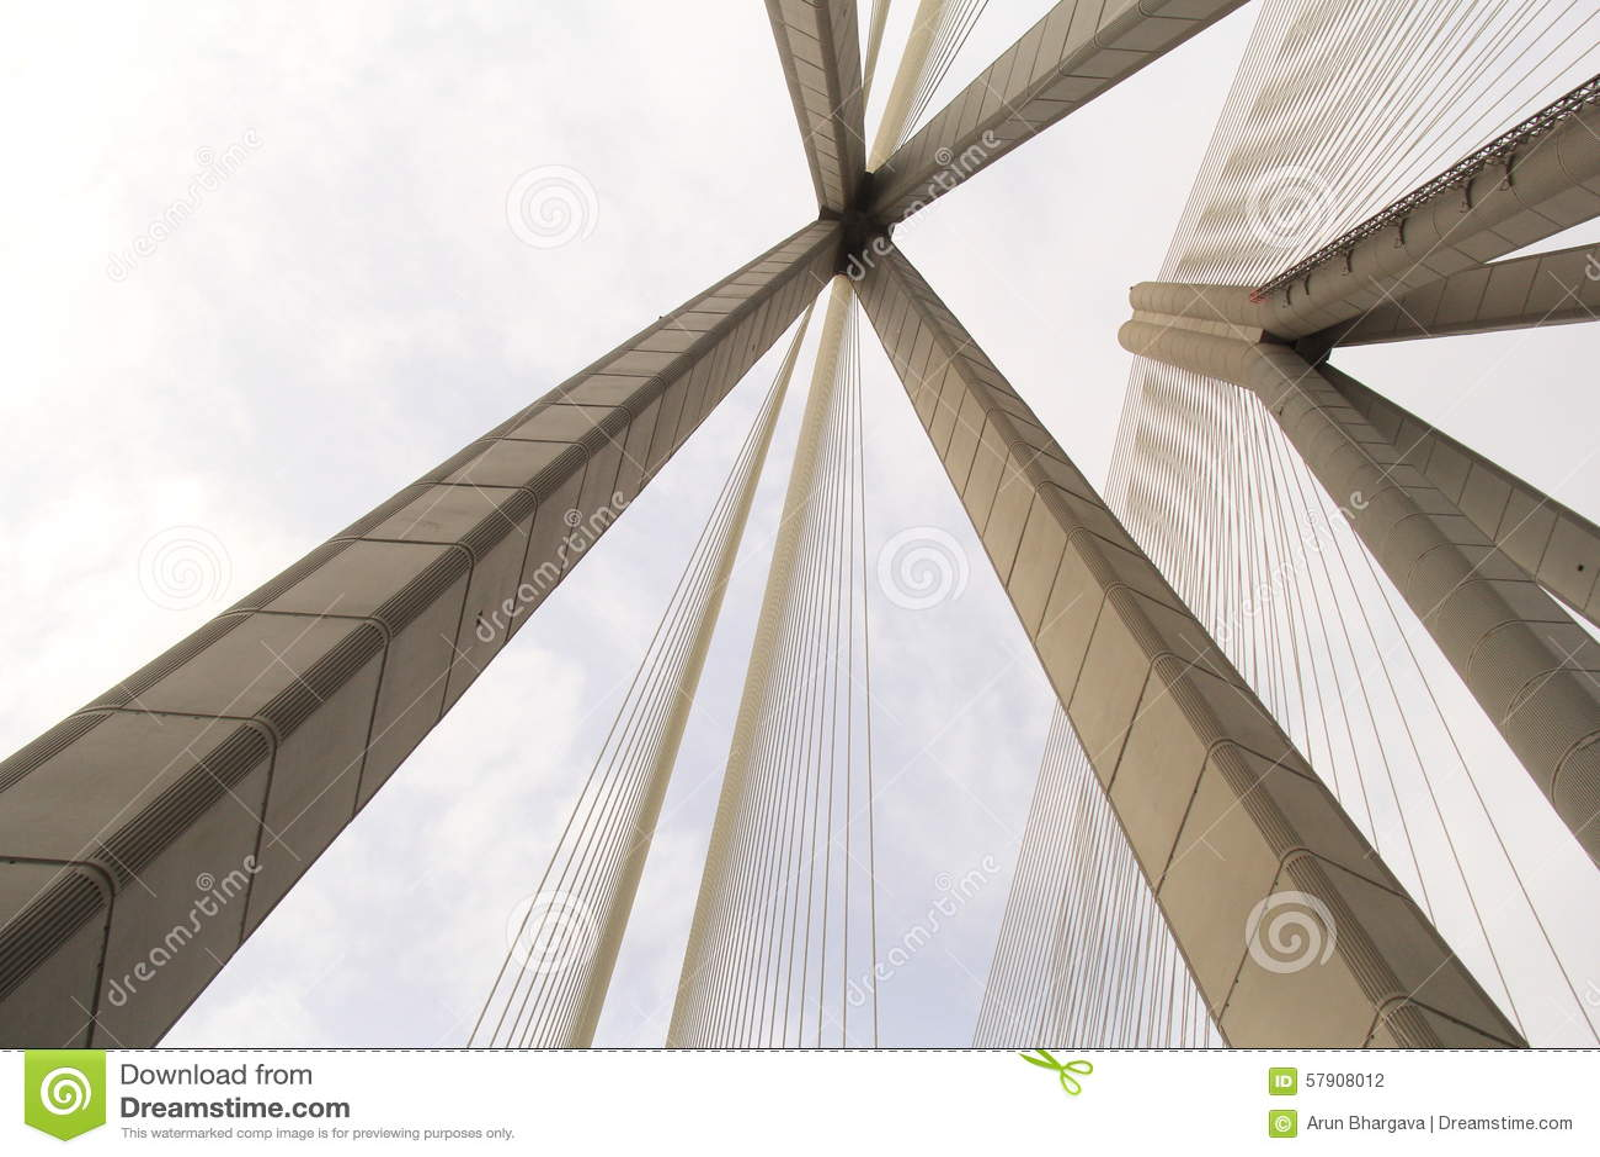 Symbol Of Strength Stock Photo Image Of Balancing Balance 57908012